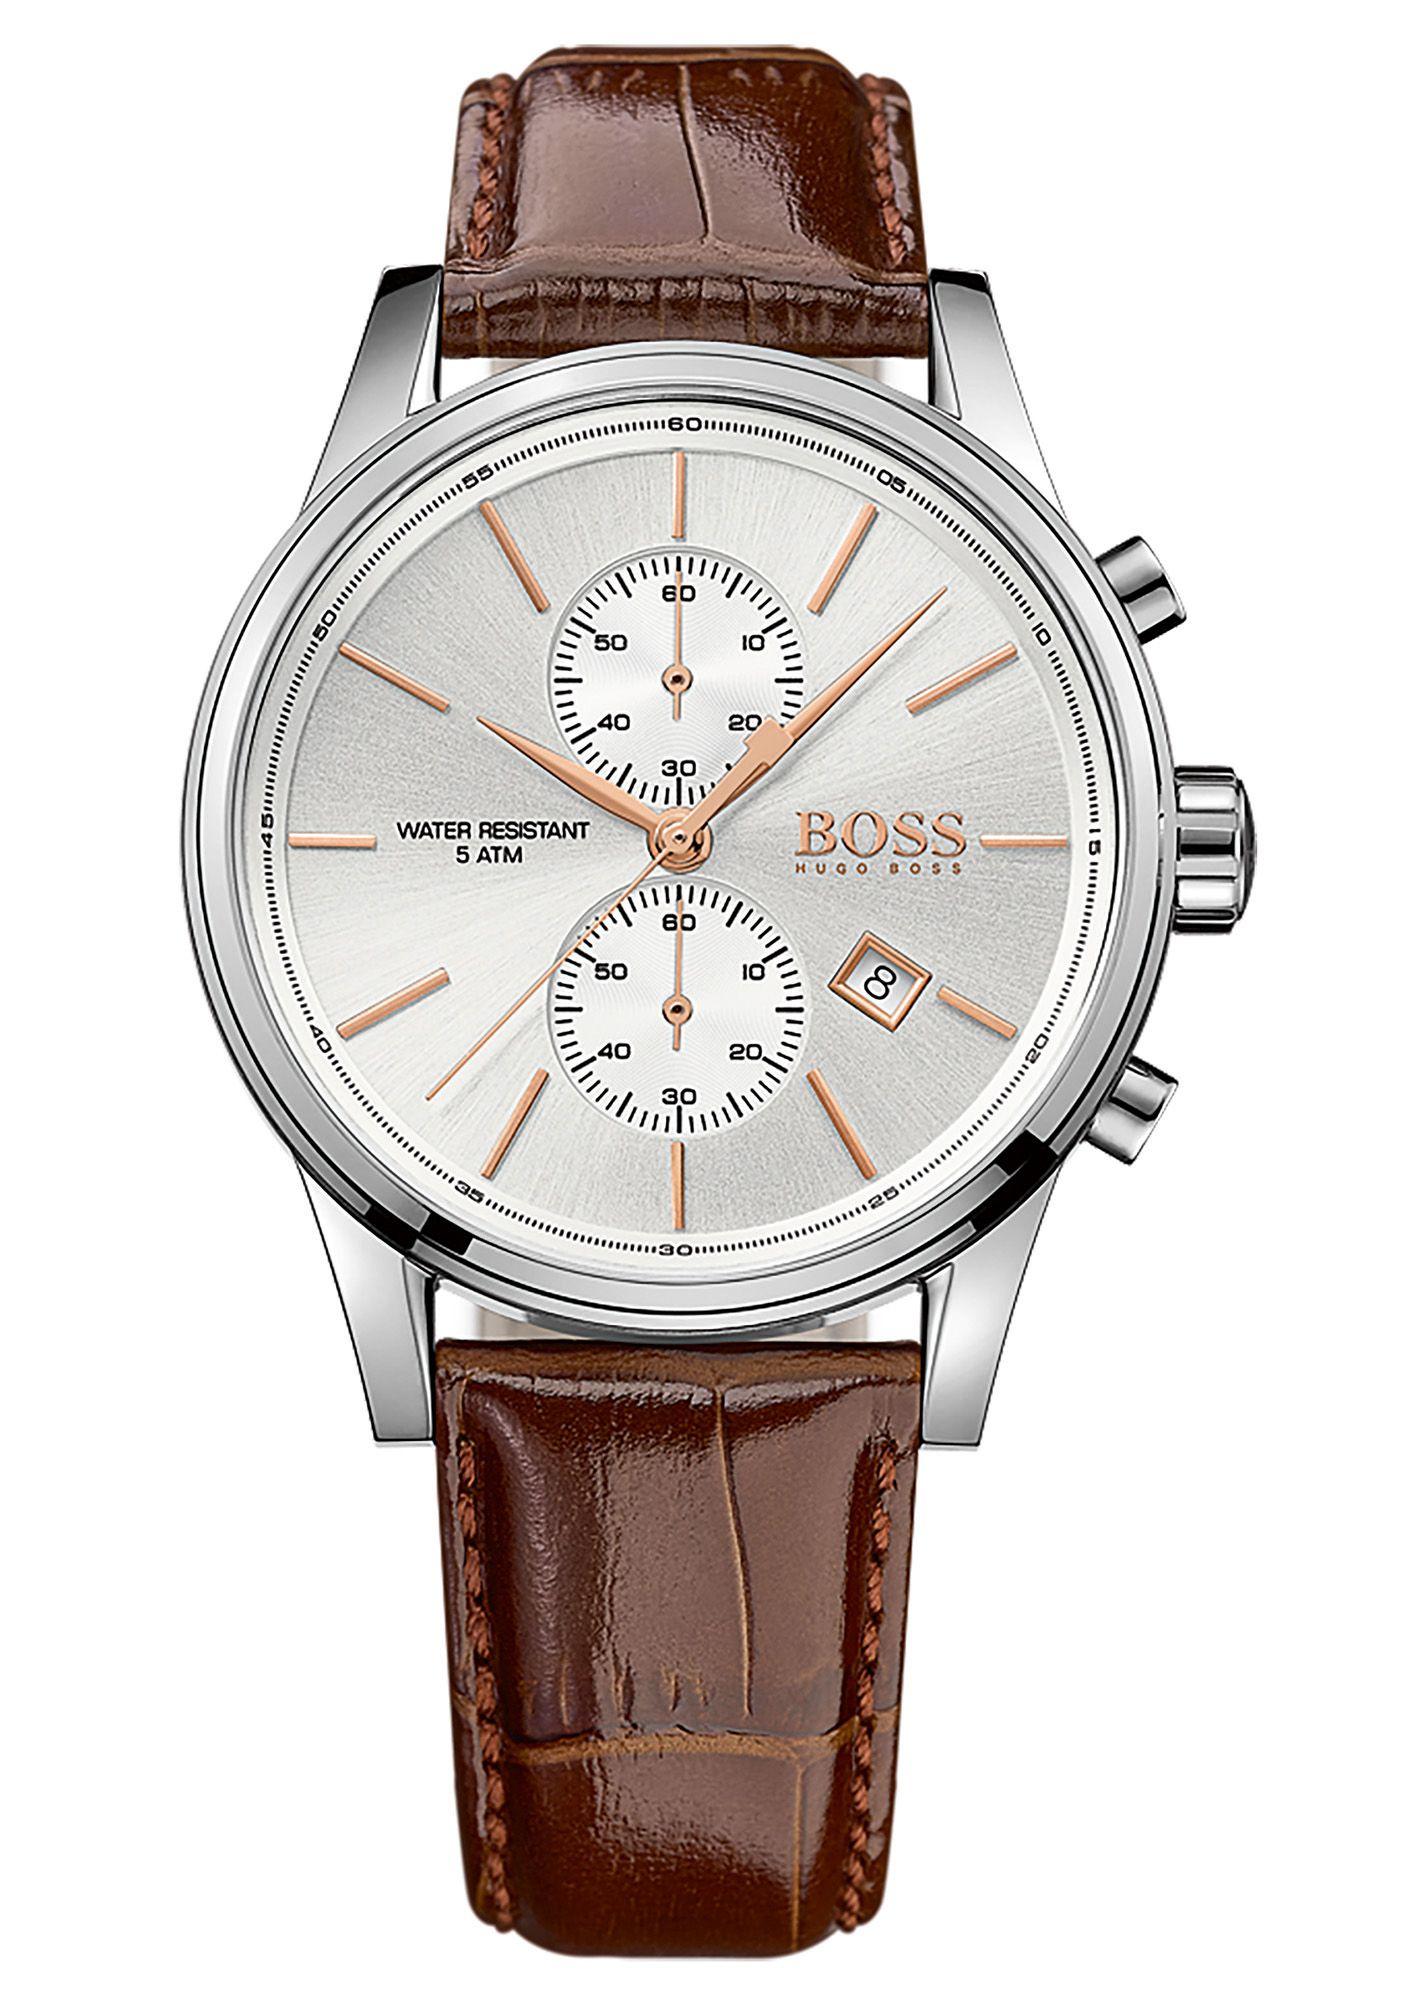 BOSS Boss Chronograph »JET, 1513280«